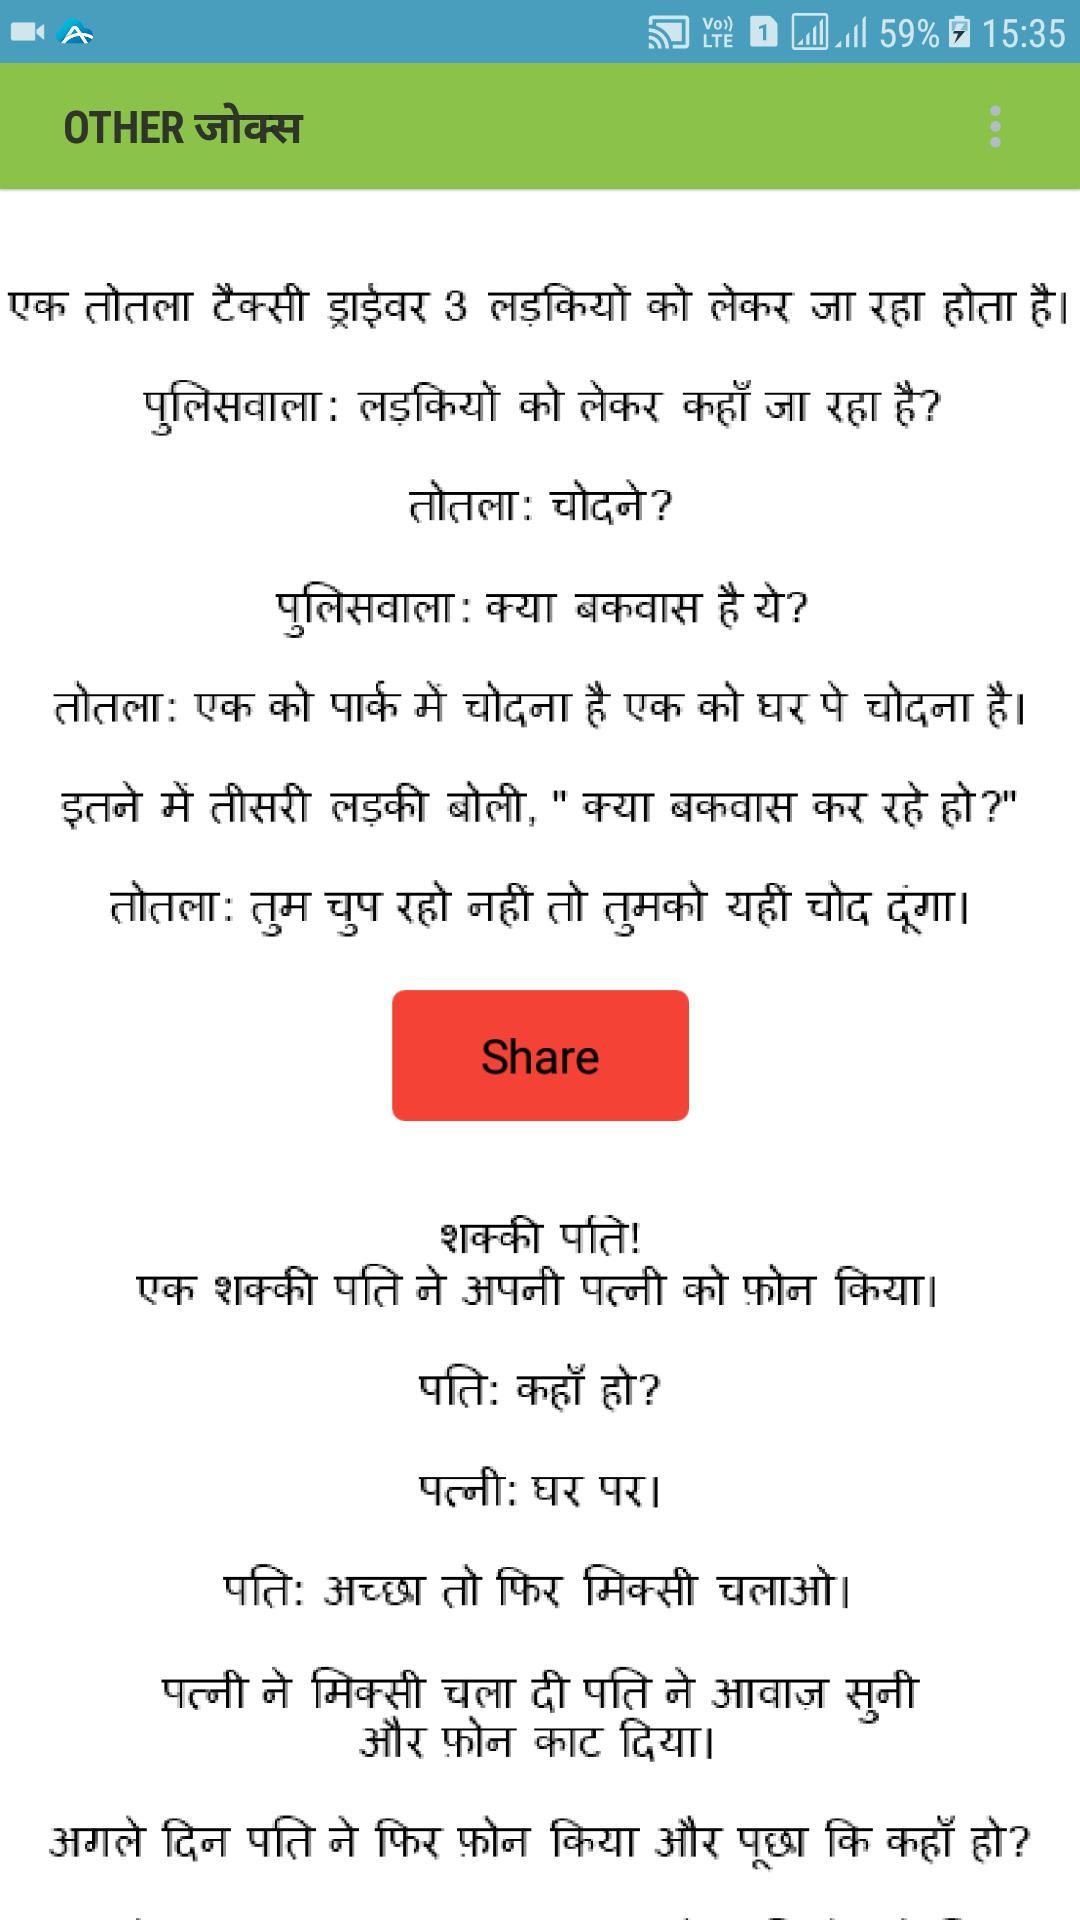 Desi Non Veg Jokes Hindi2018 for Android - APK Download